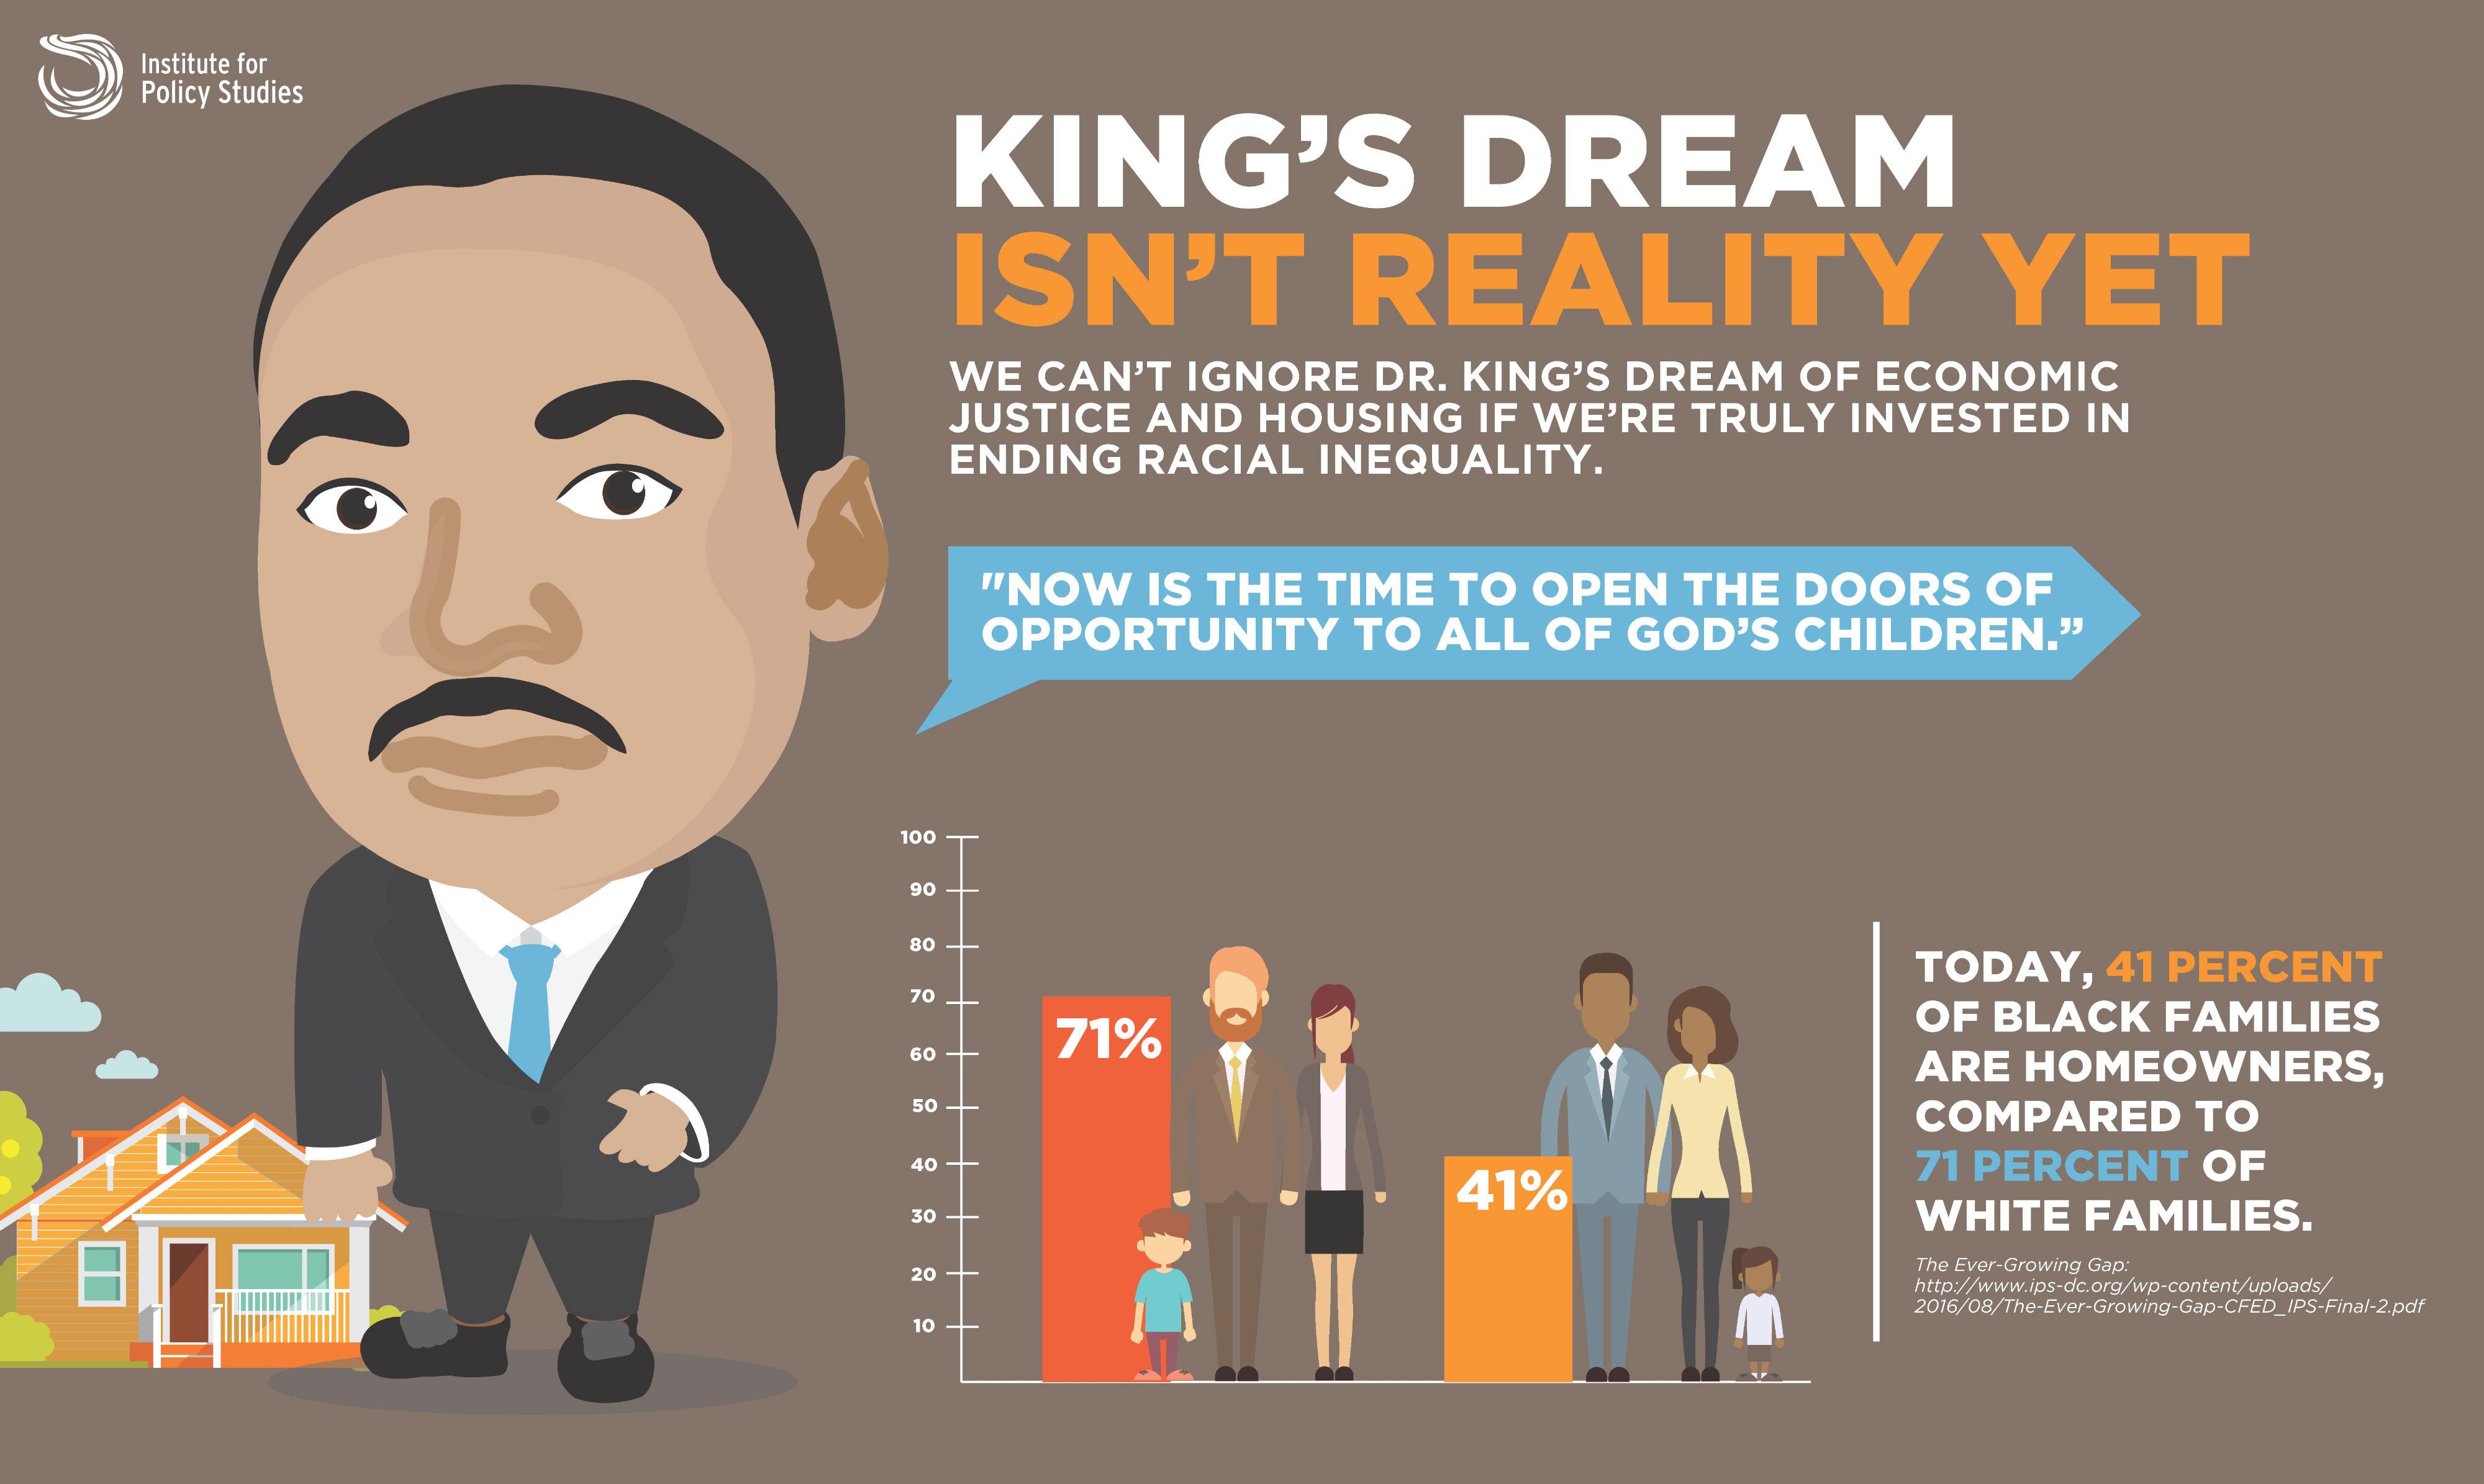 King's Dream Still Isn't Reality